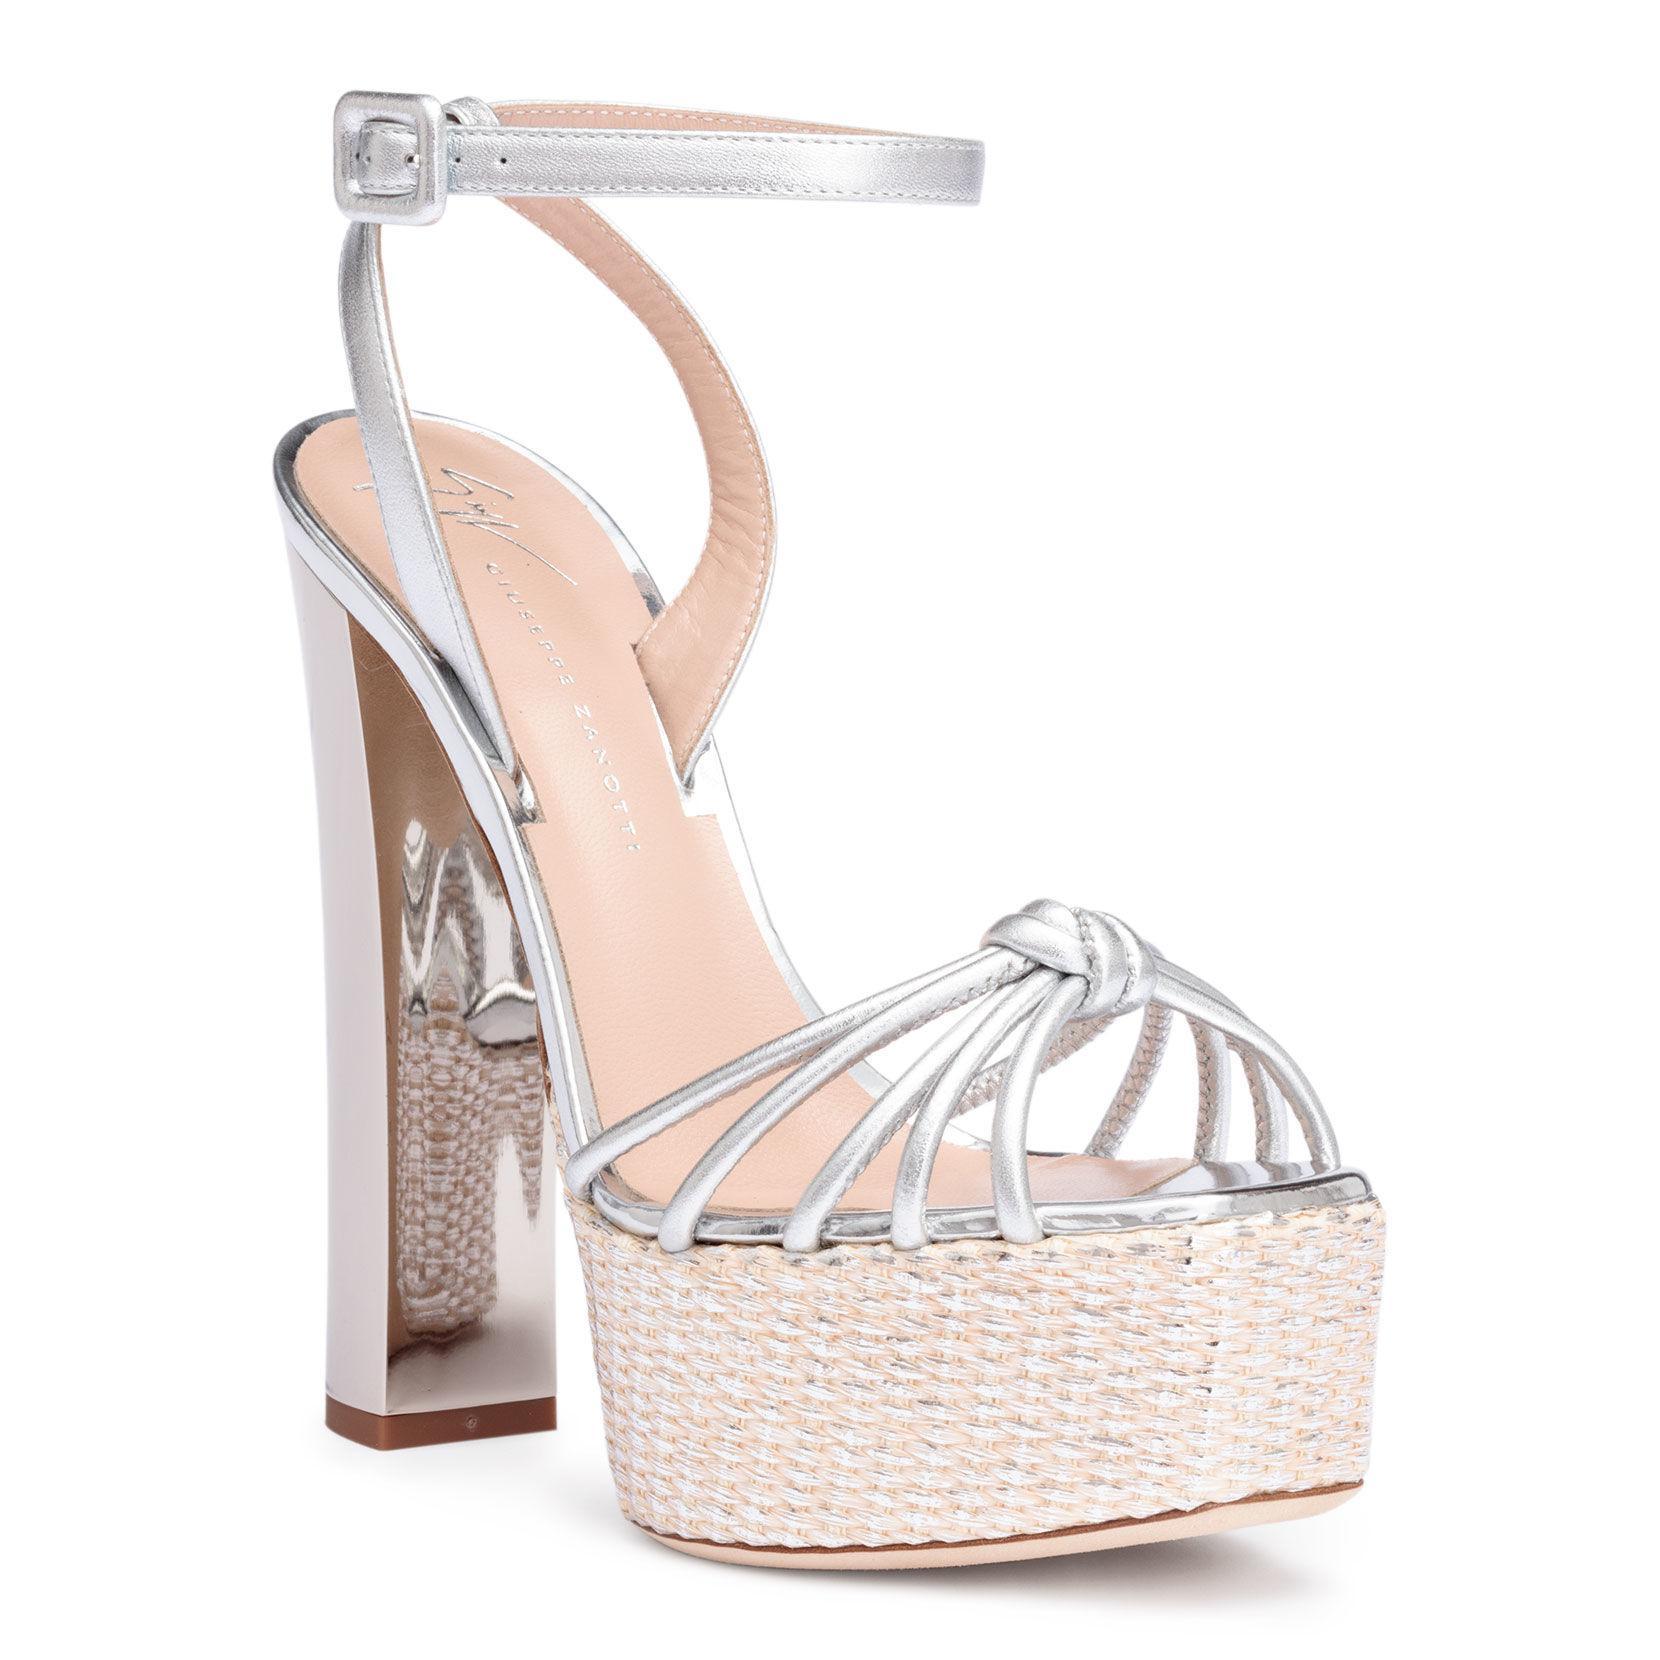 068980eccf92 Giuseppe Zanotti. Women s Silver Metallic Leather Platform Sandals